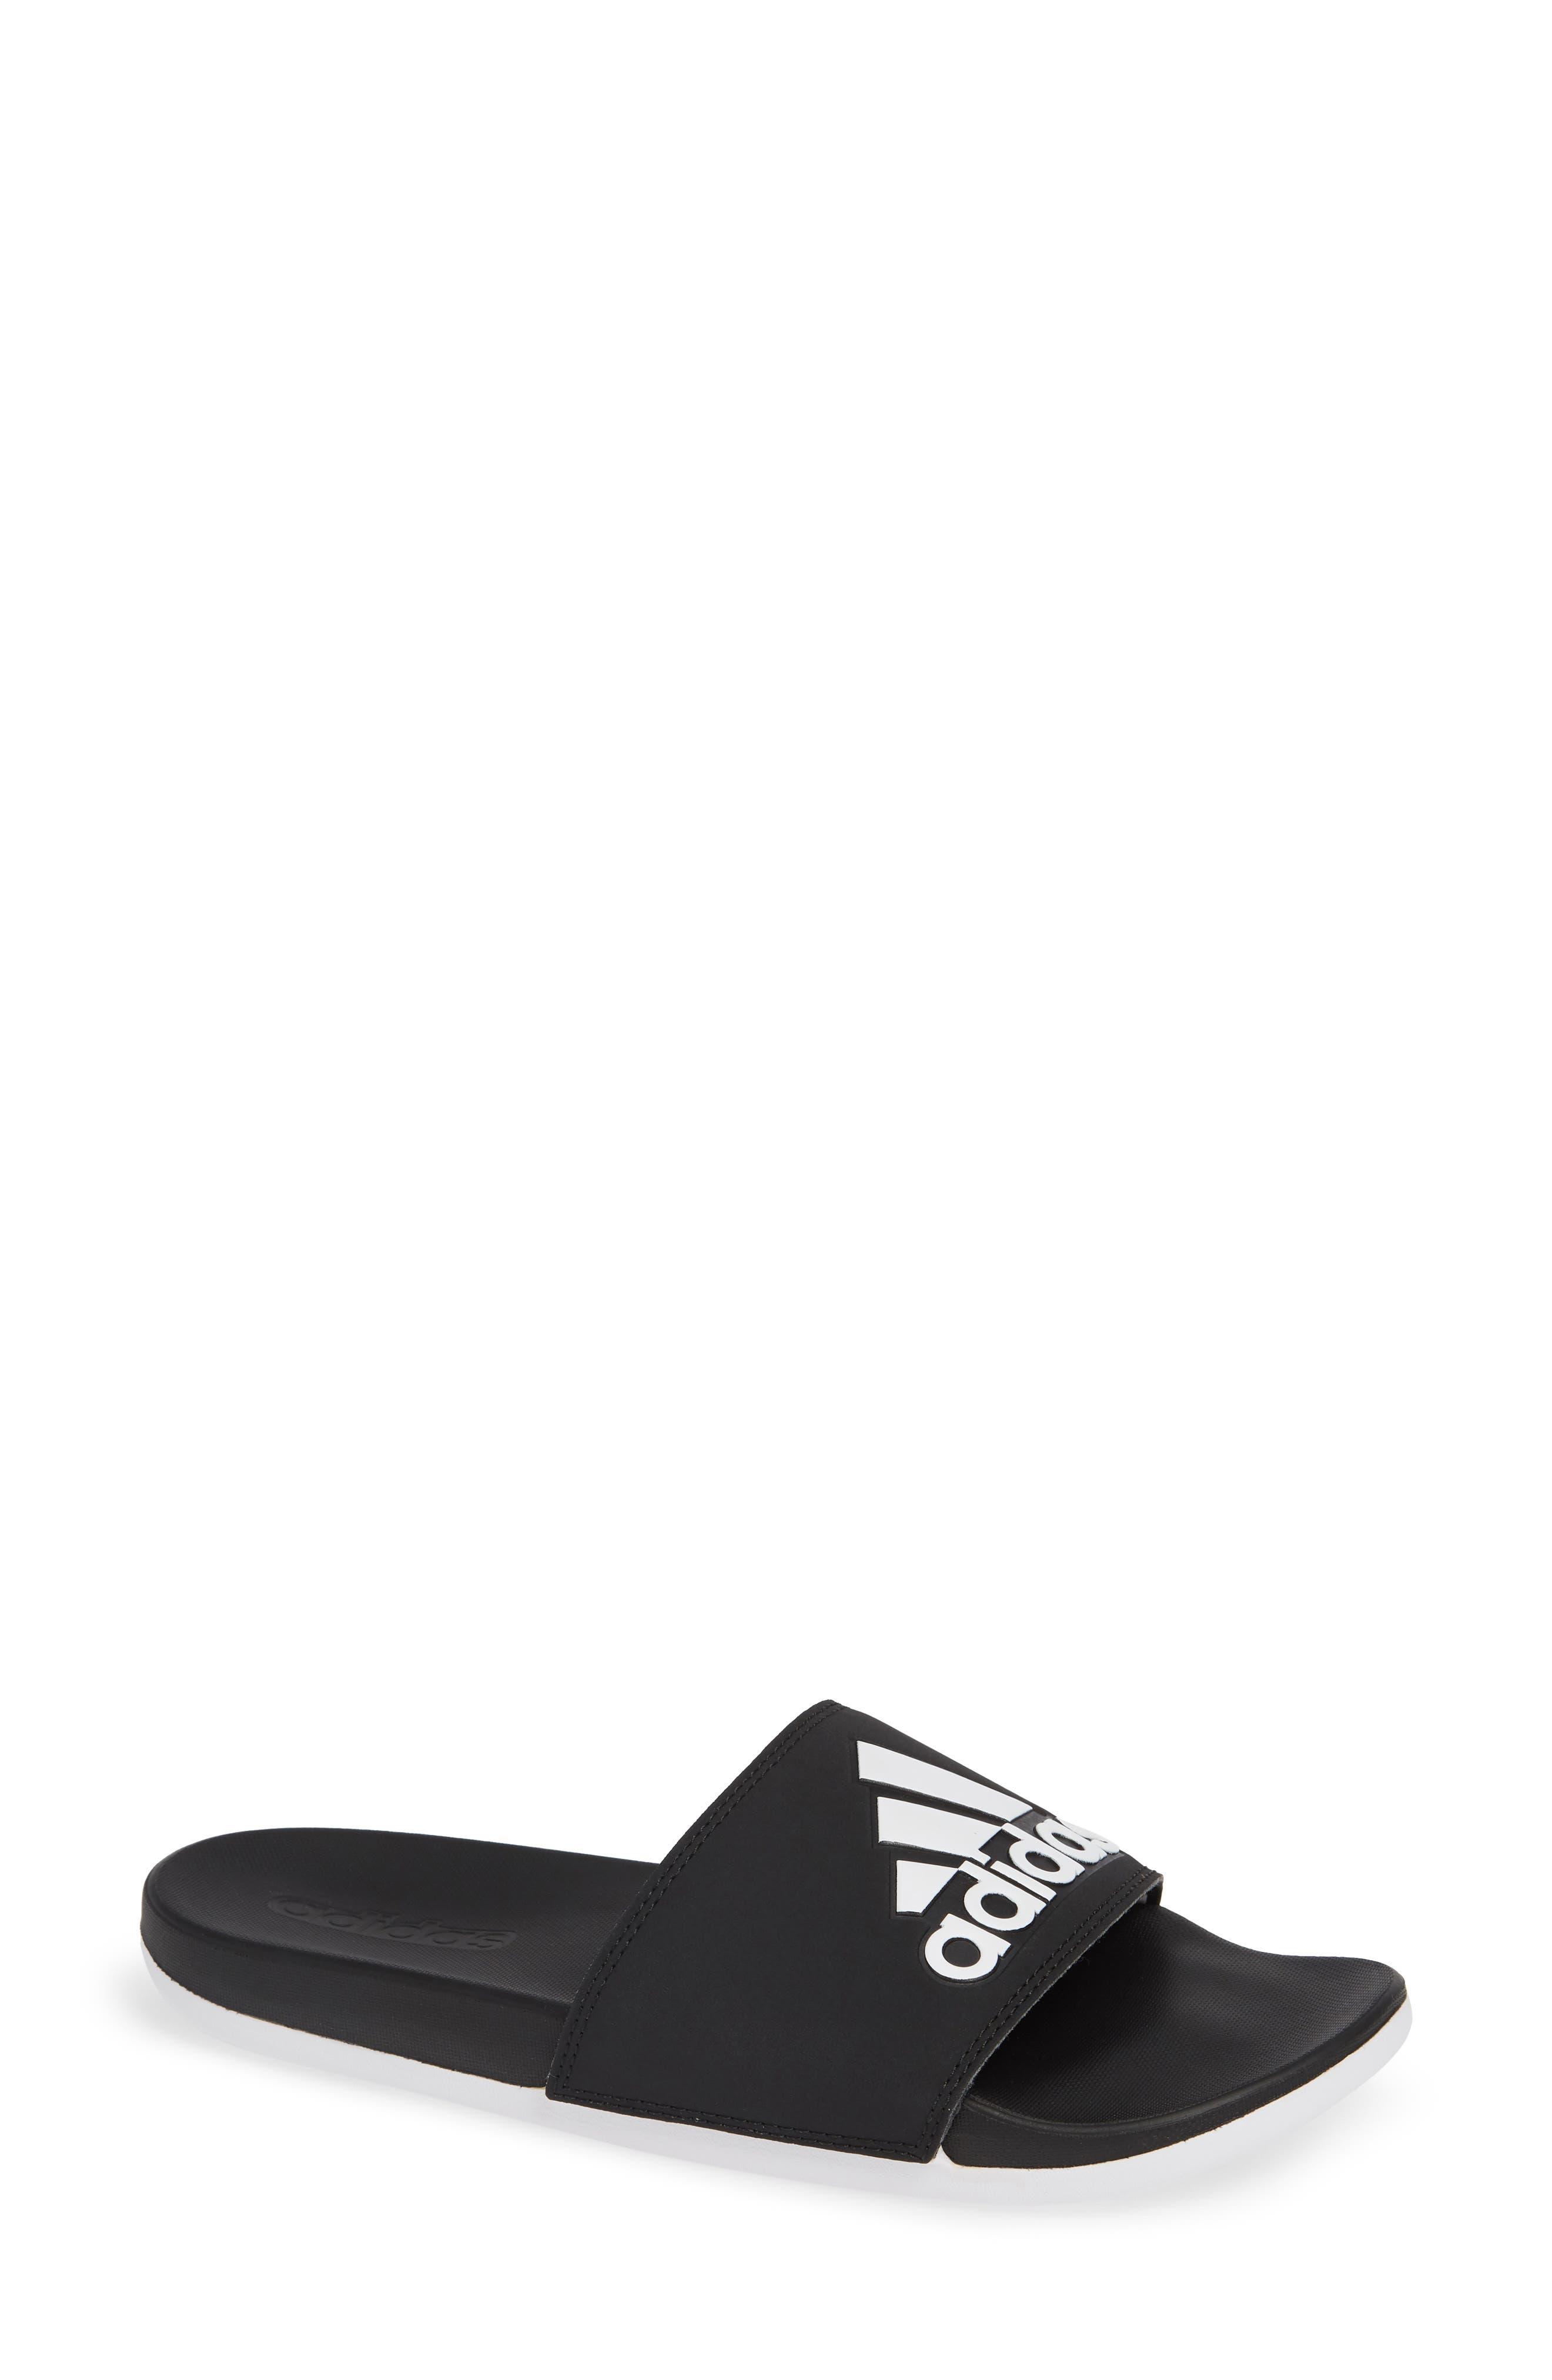 ,                             Adilette Comfort Slide Sandal,                             Main thumbnail 1, color,                             BLACK/ BLACK/ WHITE